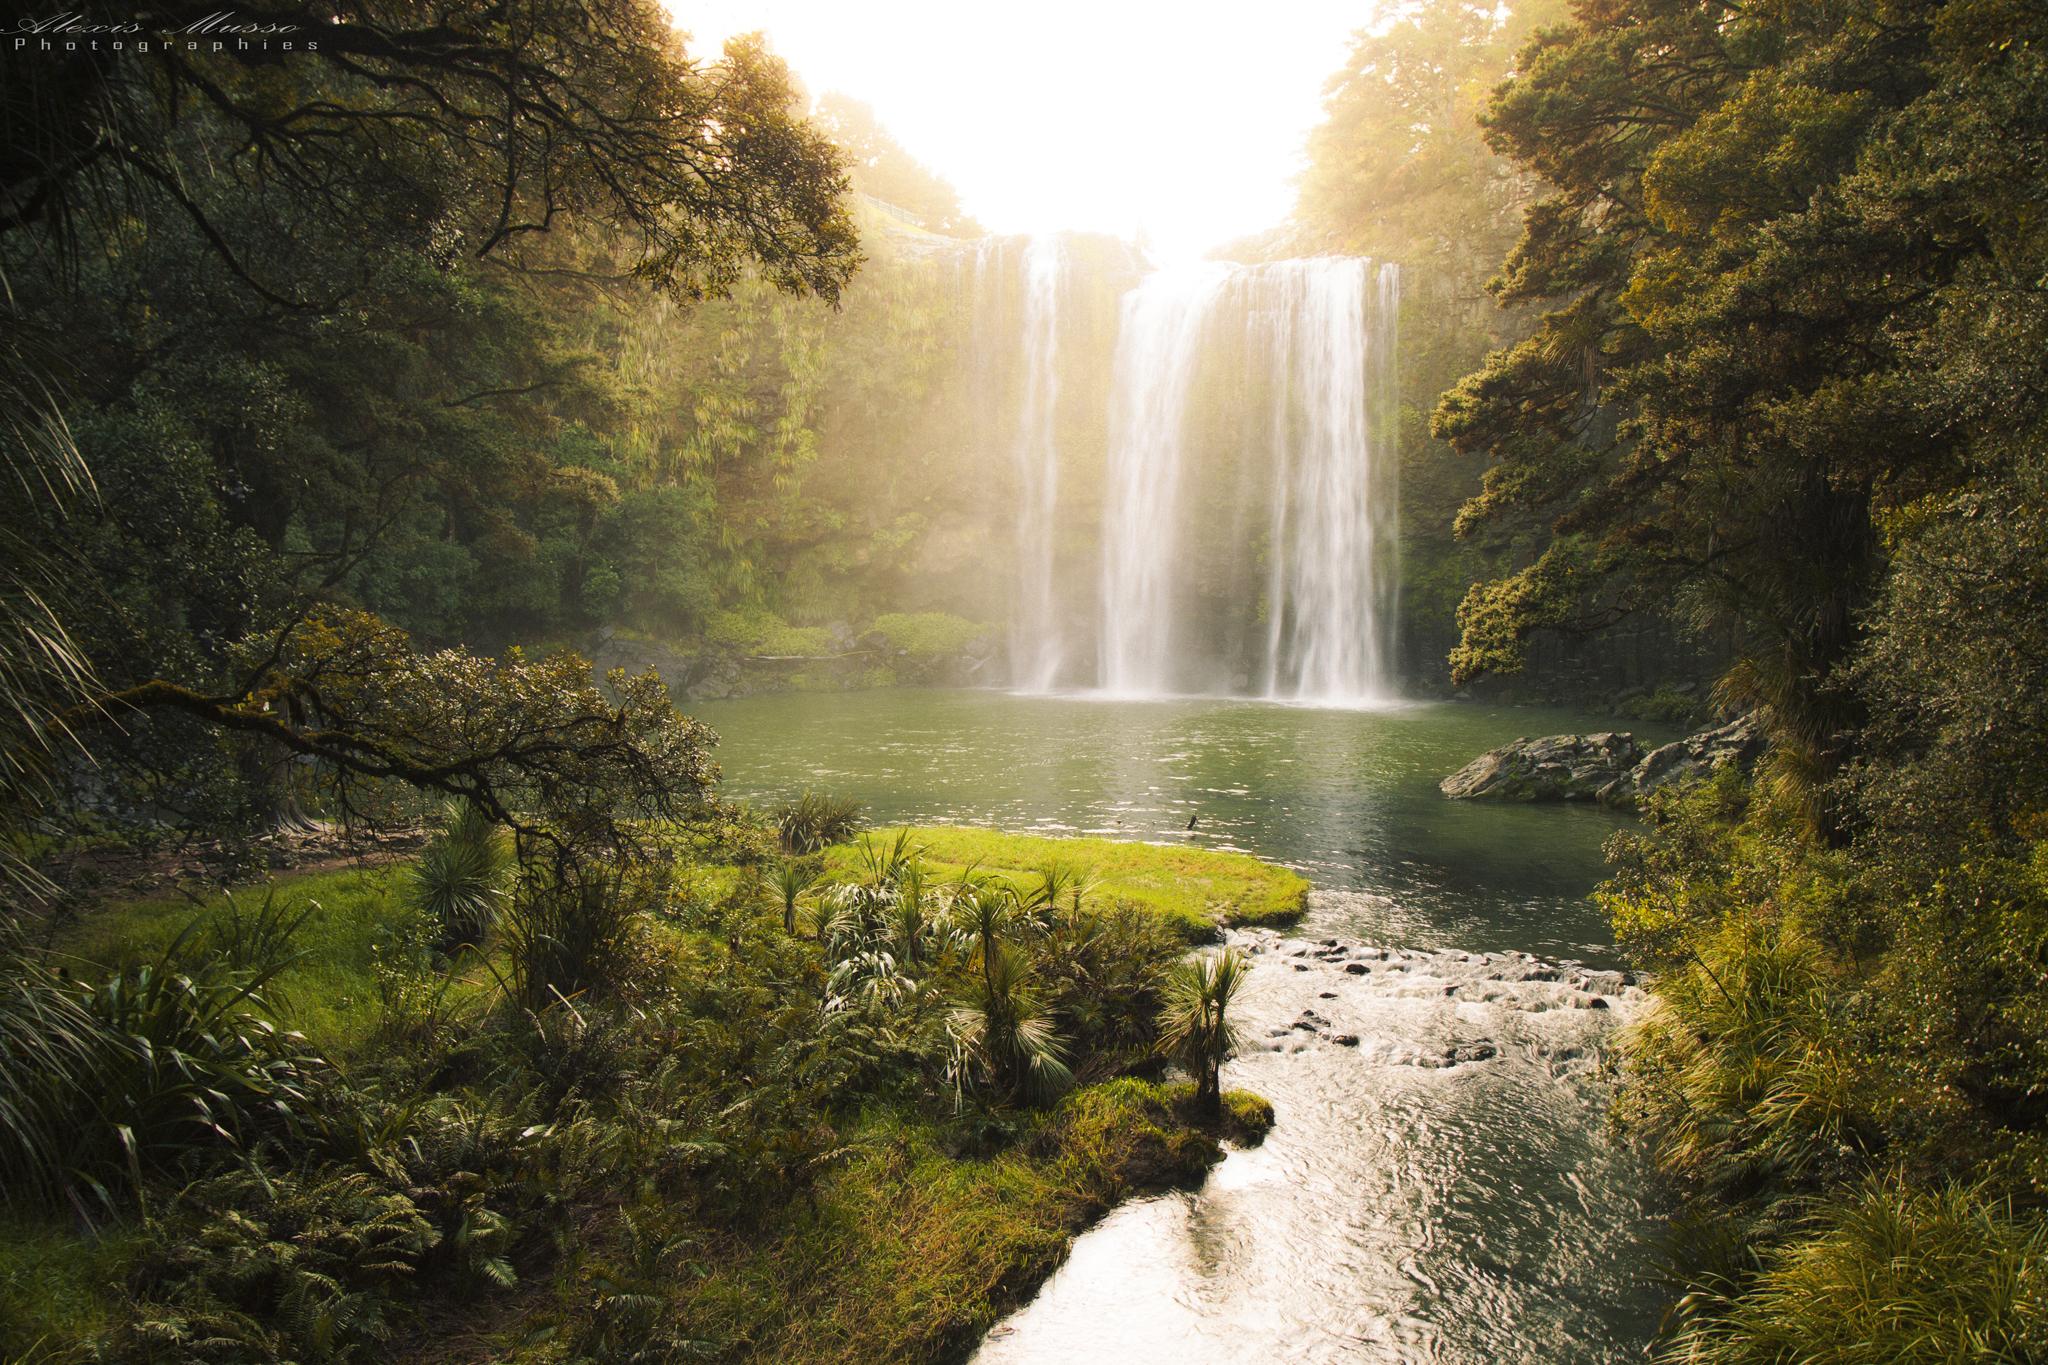 Whangarei Fall, New Zealand